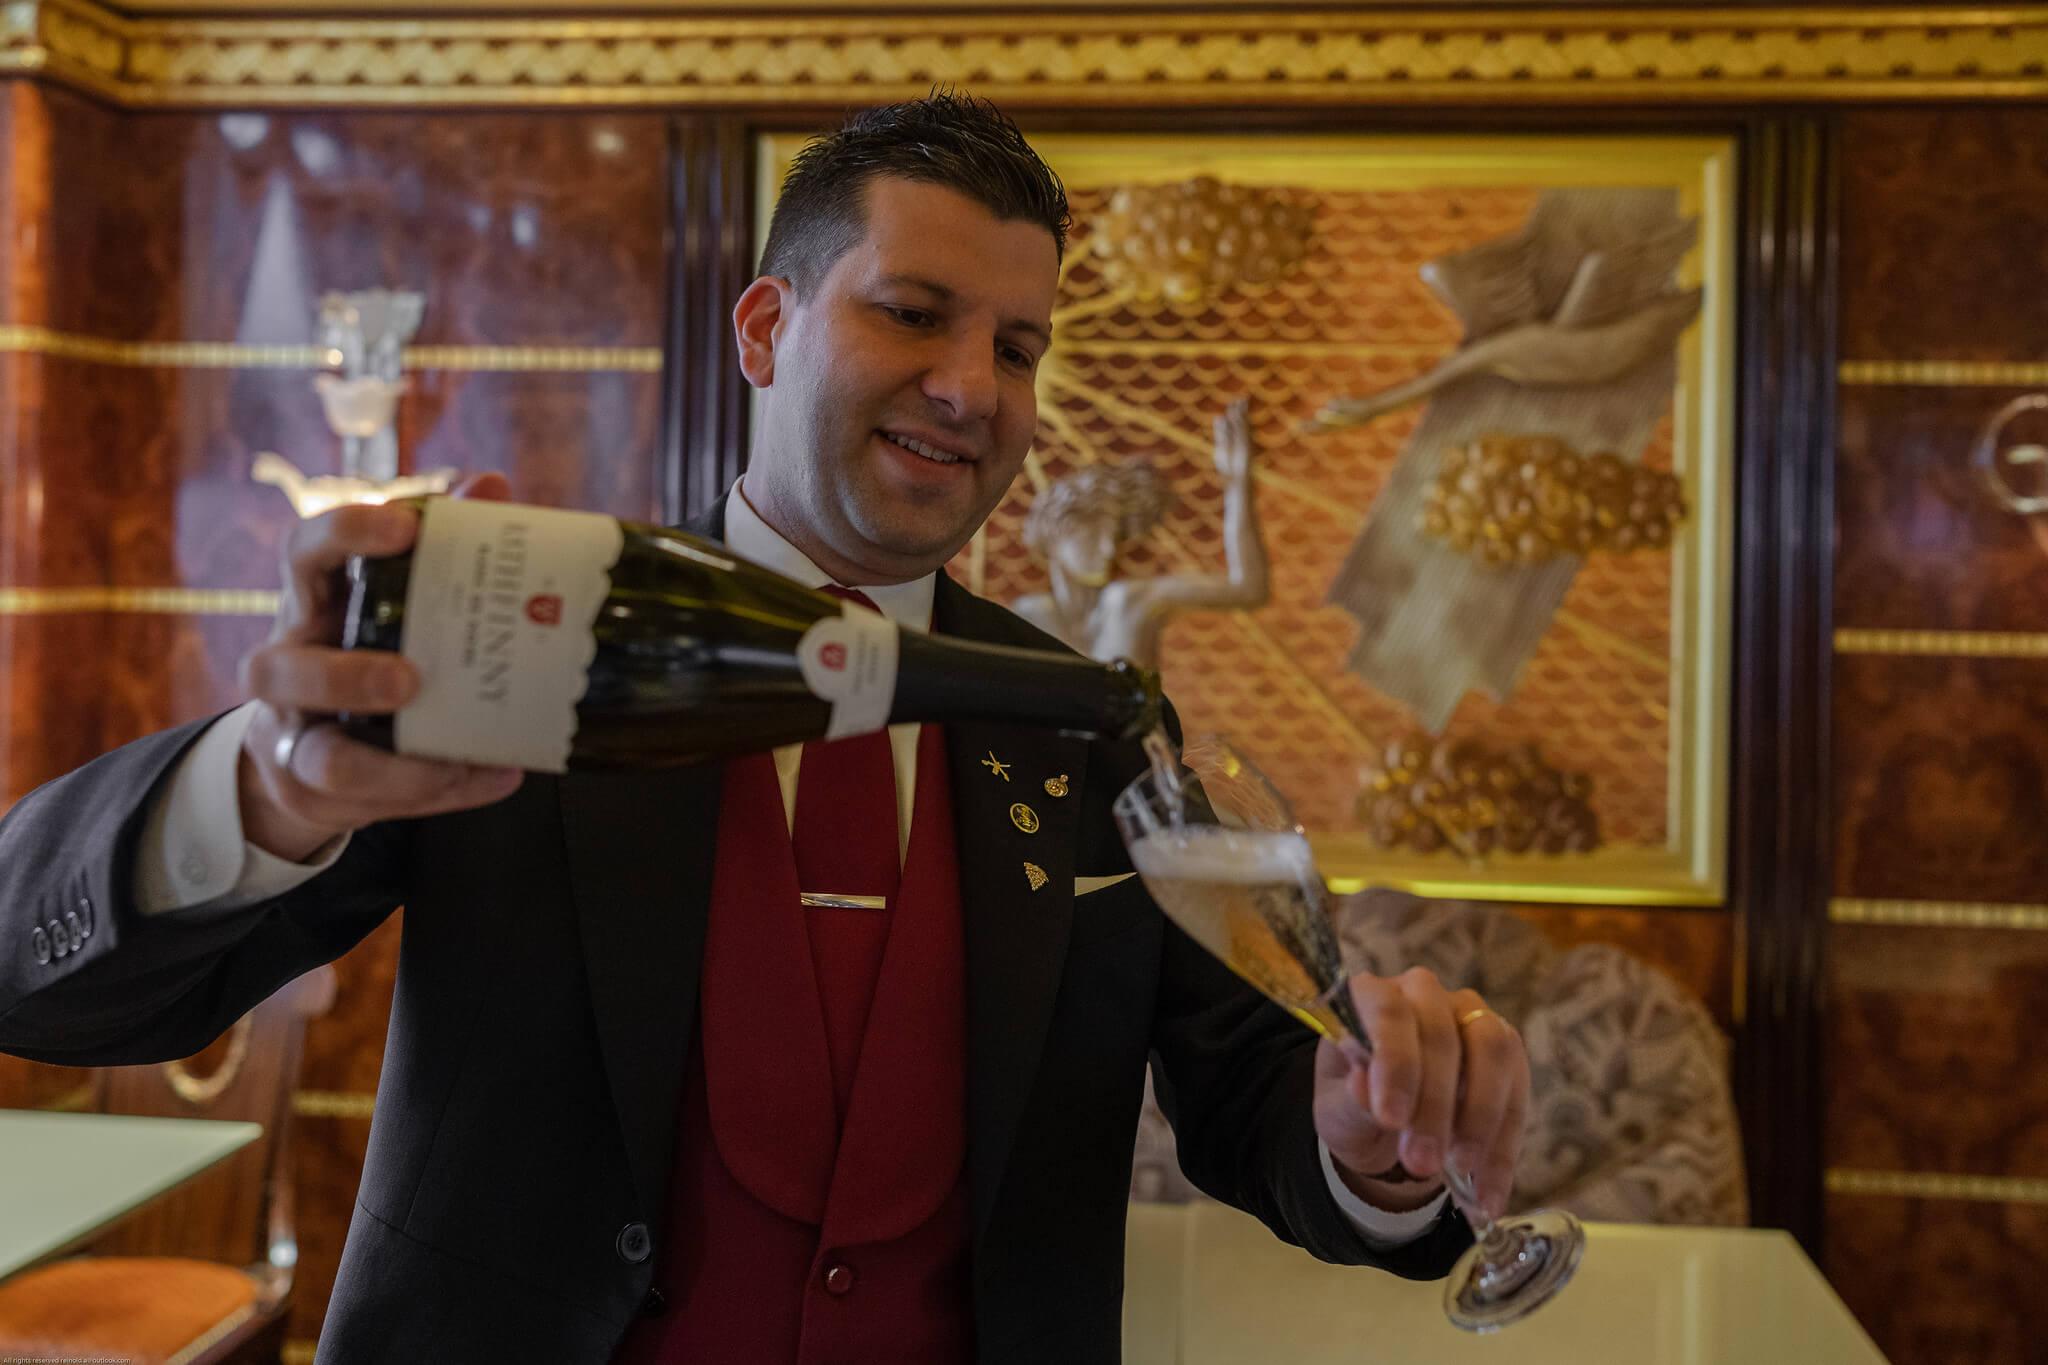 Ritz Sommelier Pouring Rathfinny